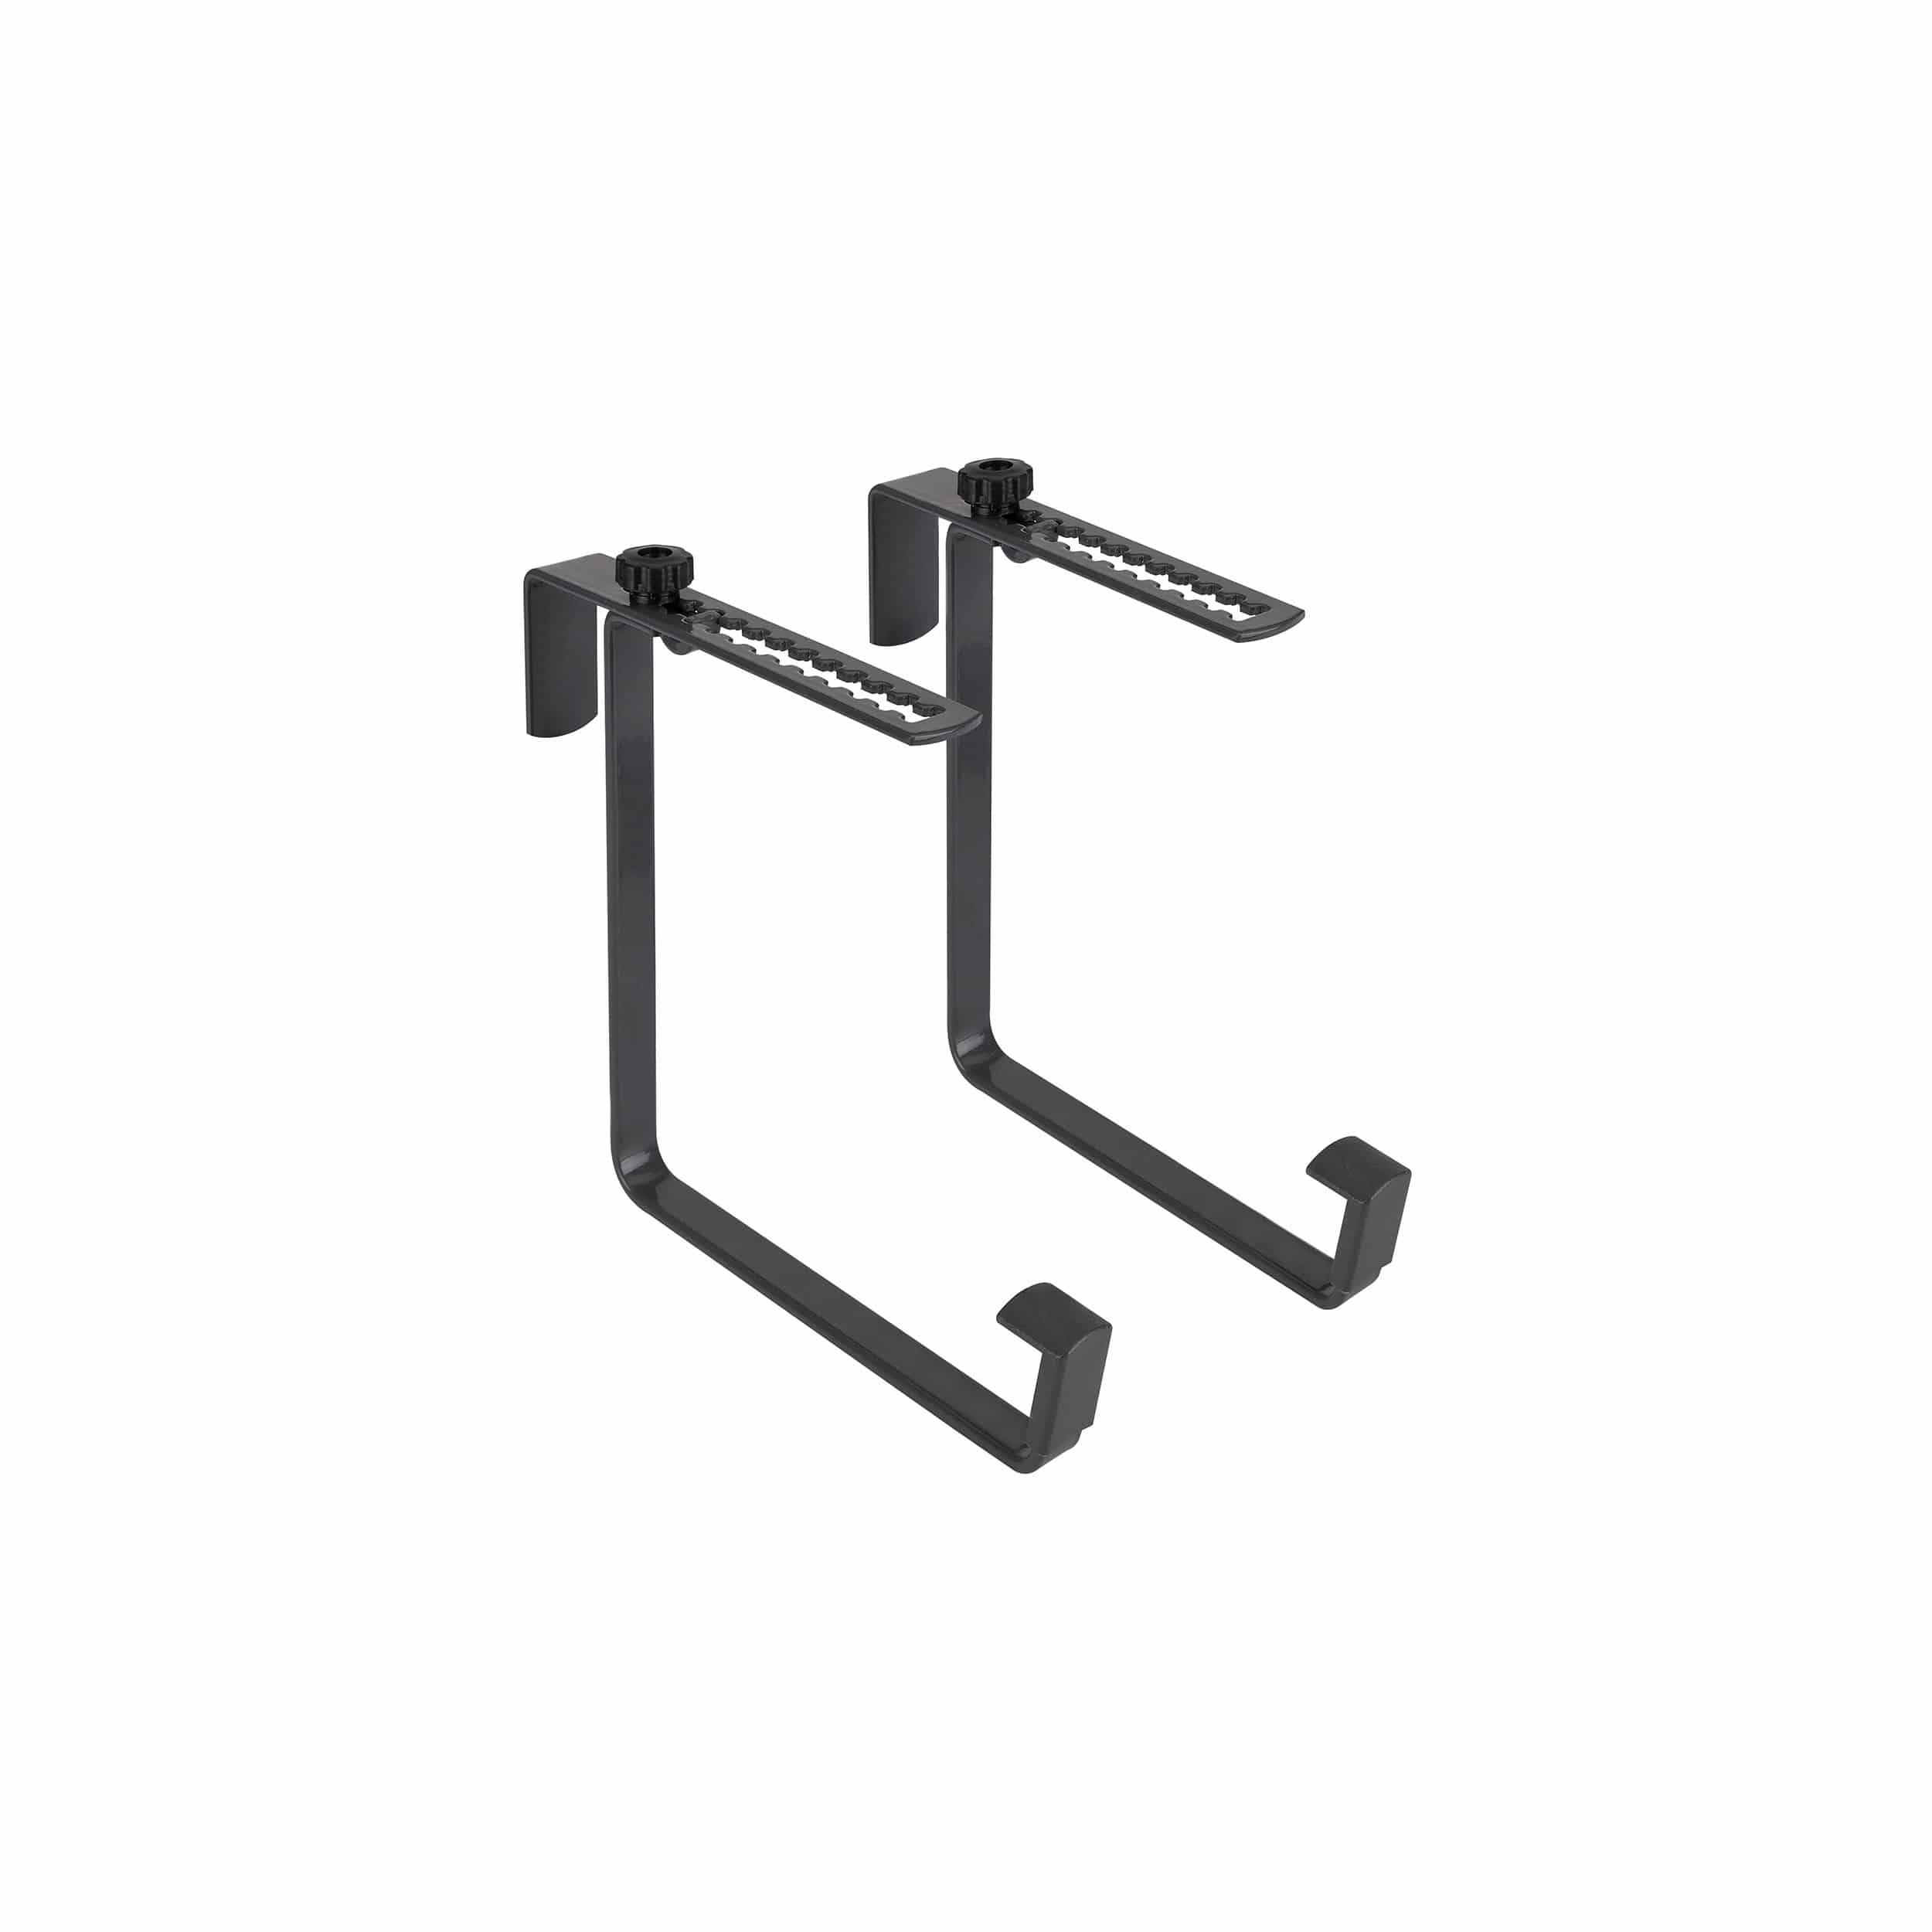 Balkonkastenhalterung Barcelona Metall